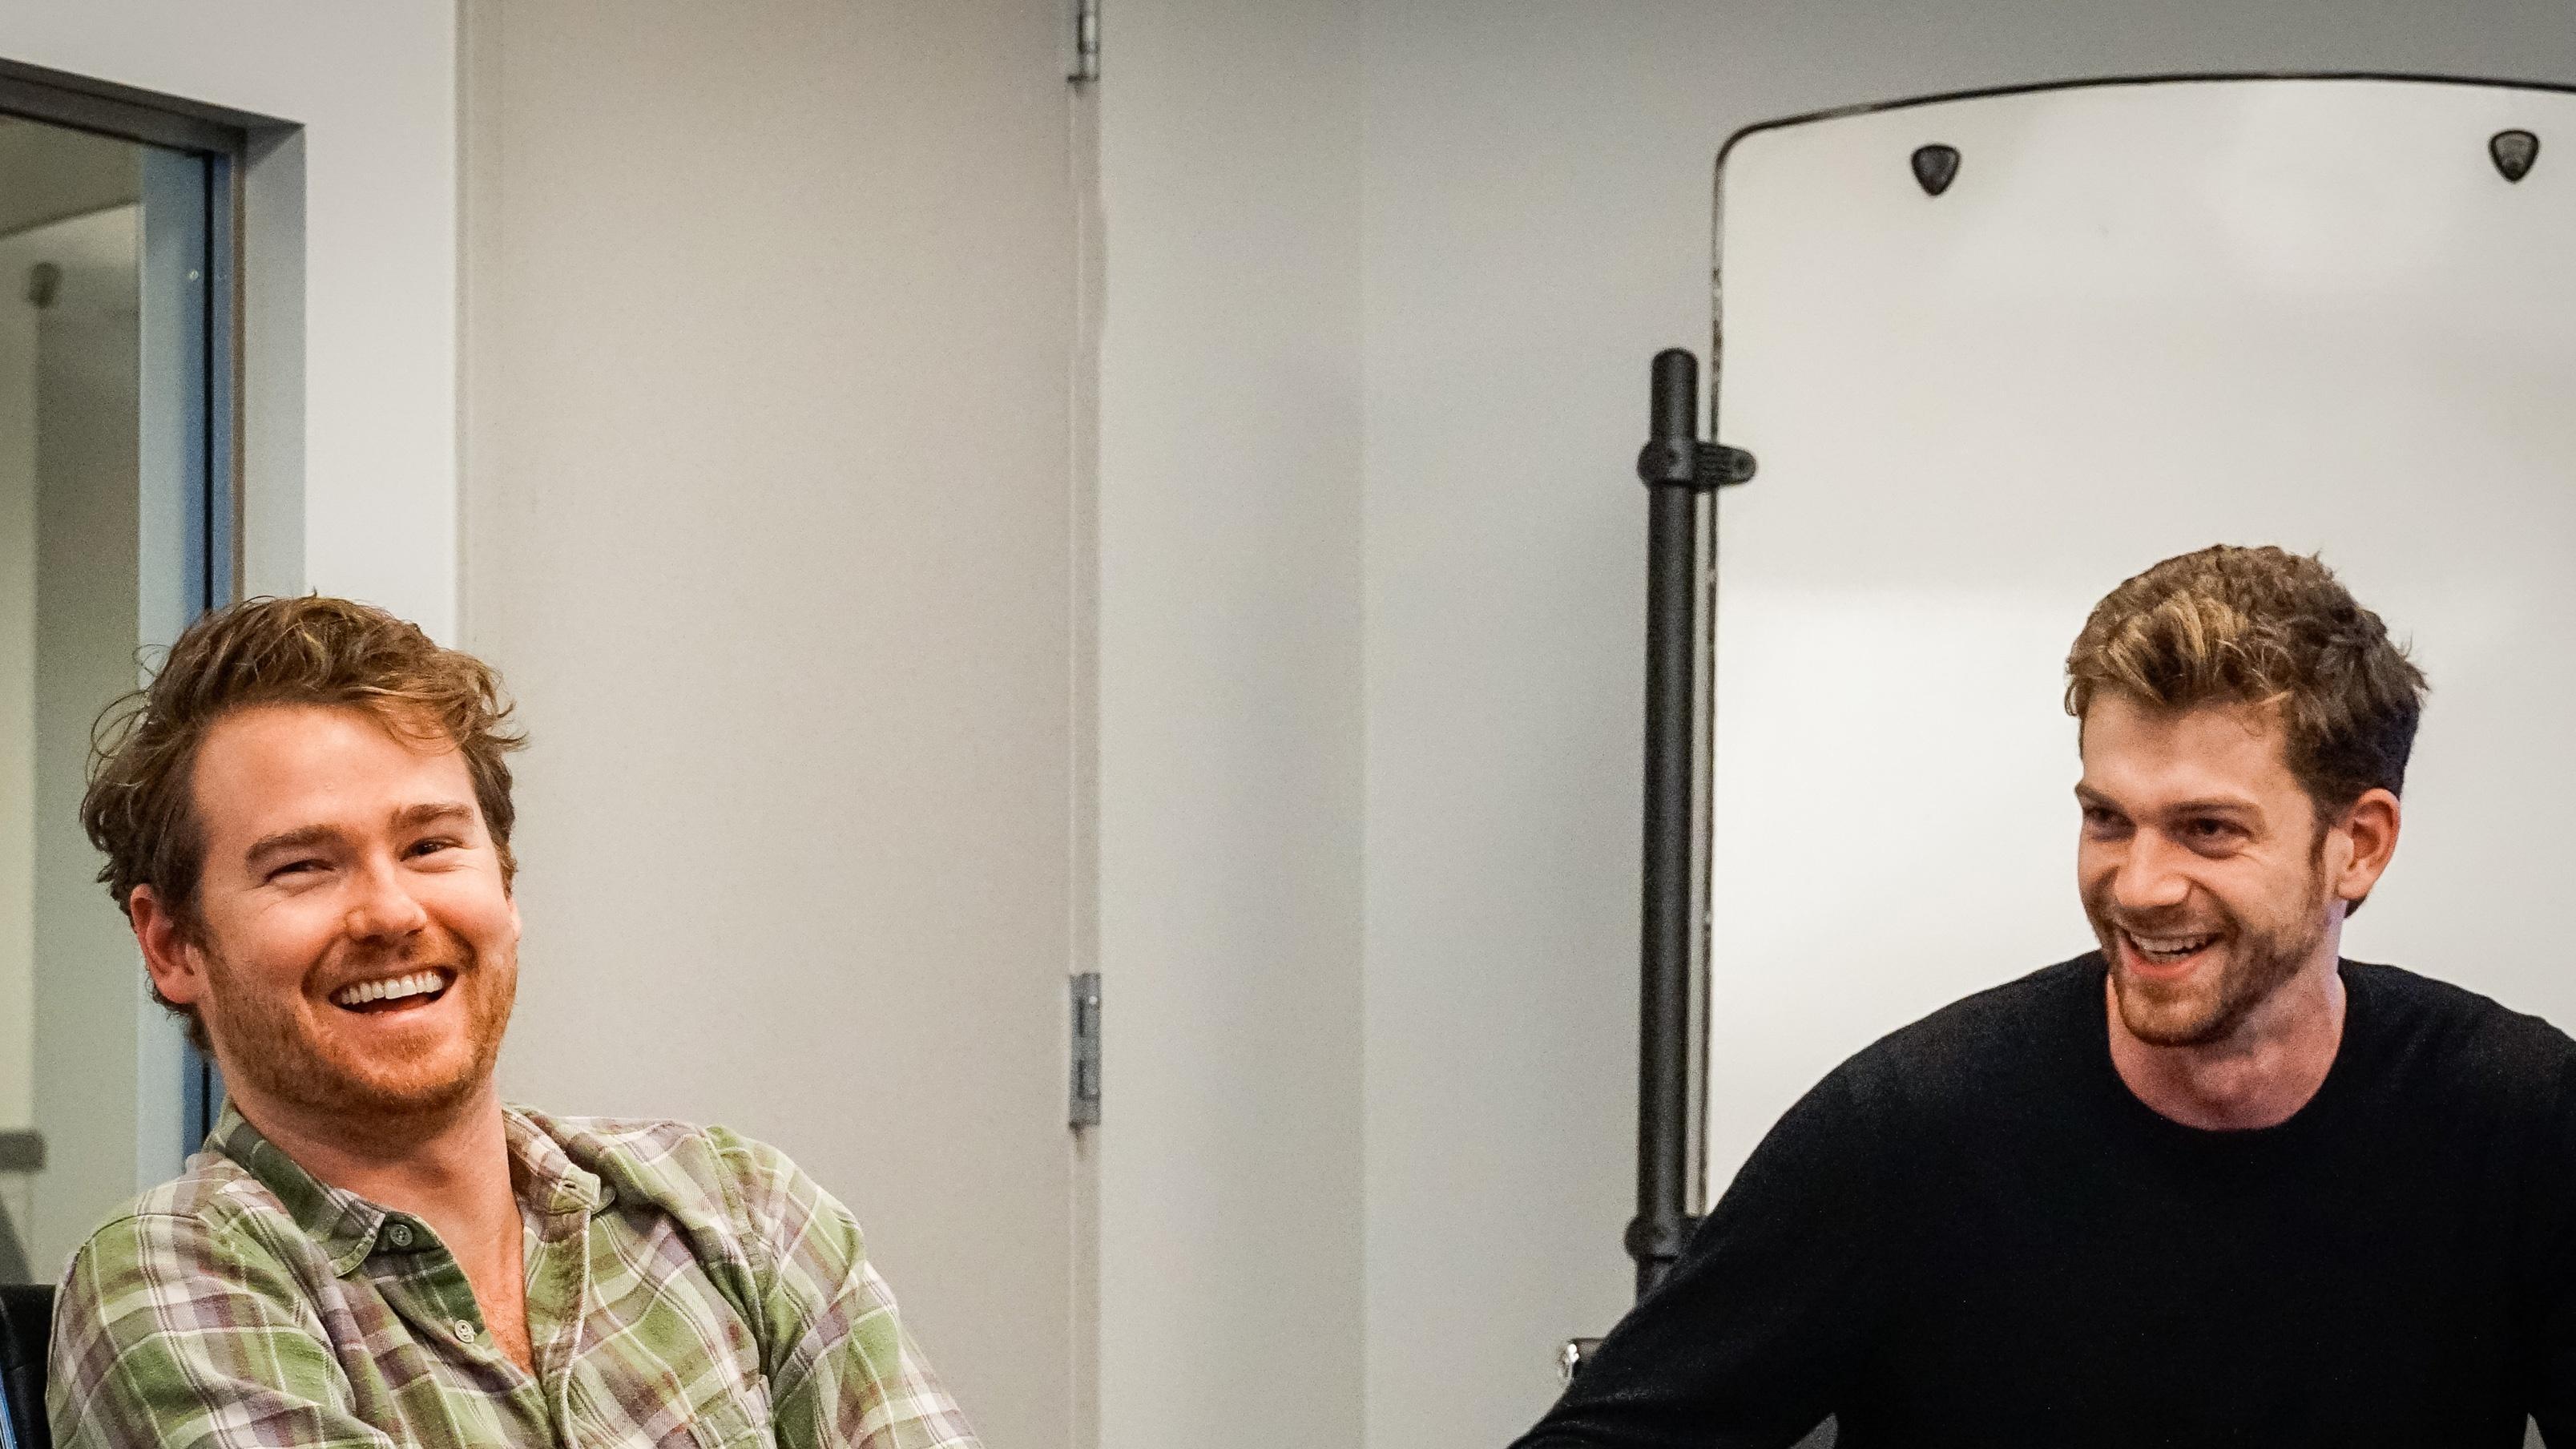 Eden Health cofounders CEO Matt McCambridge (L) and chief product officer Scott Sansovich (R).